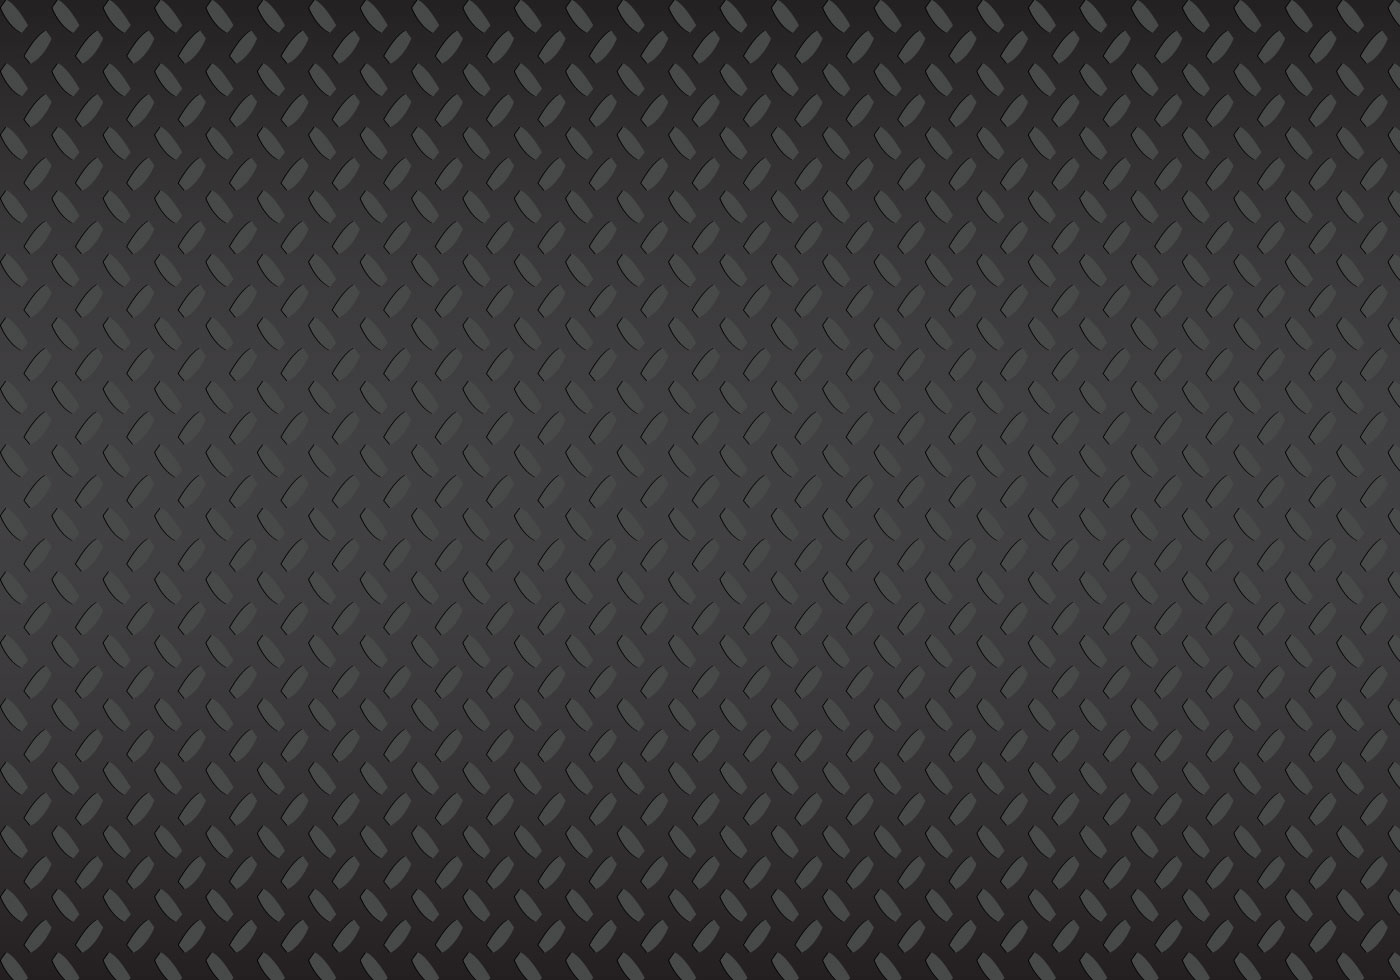 Free Black Metal Vector Download Free Vector Art Stock Graphics Amp Images